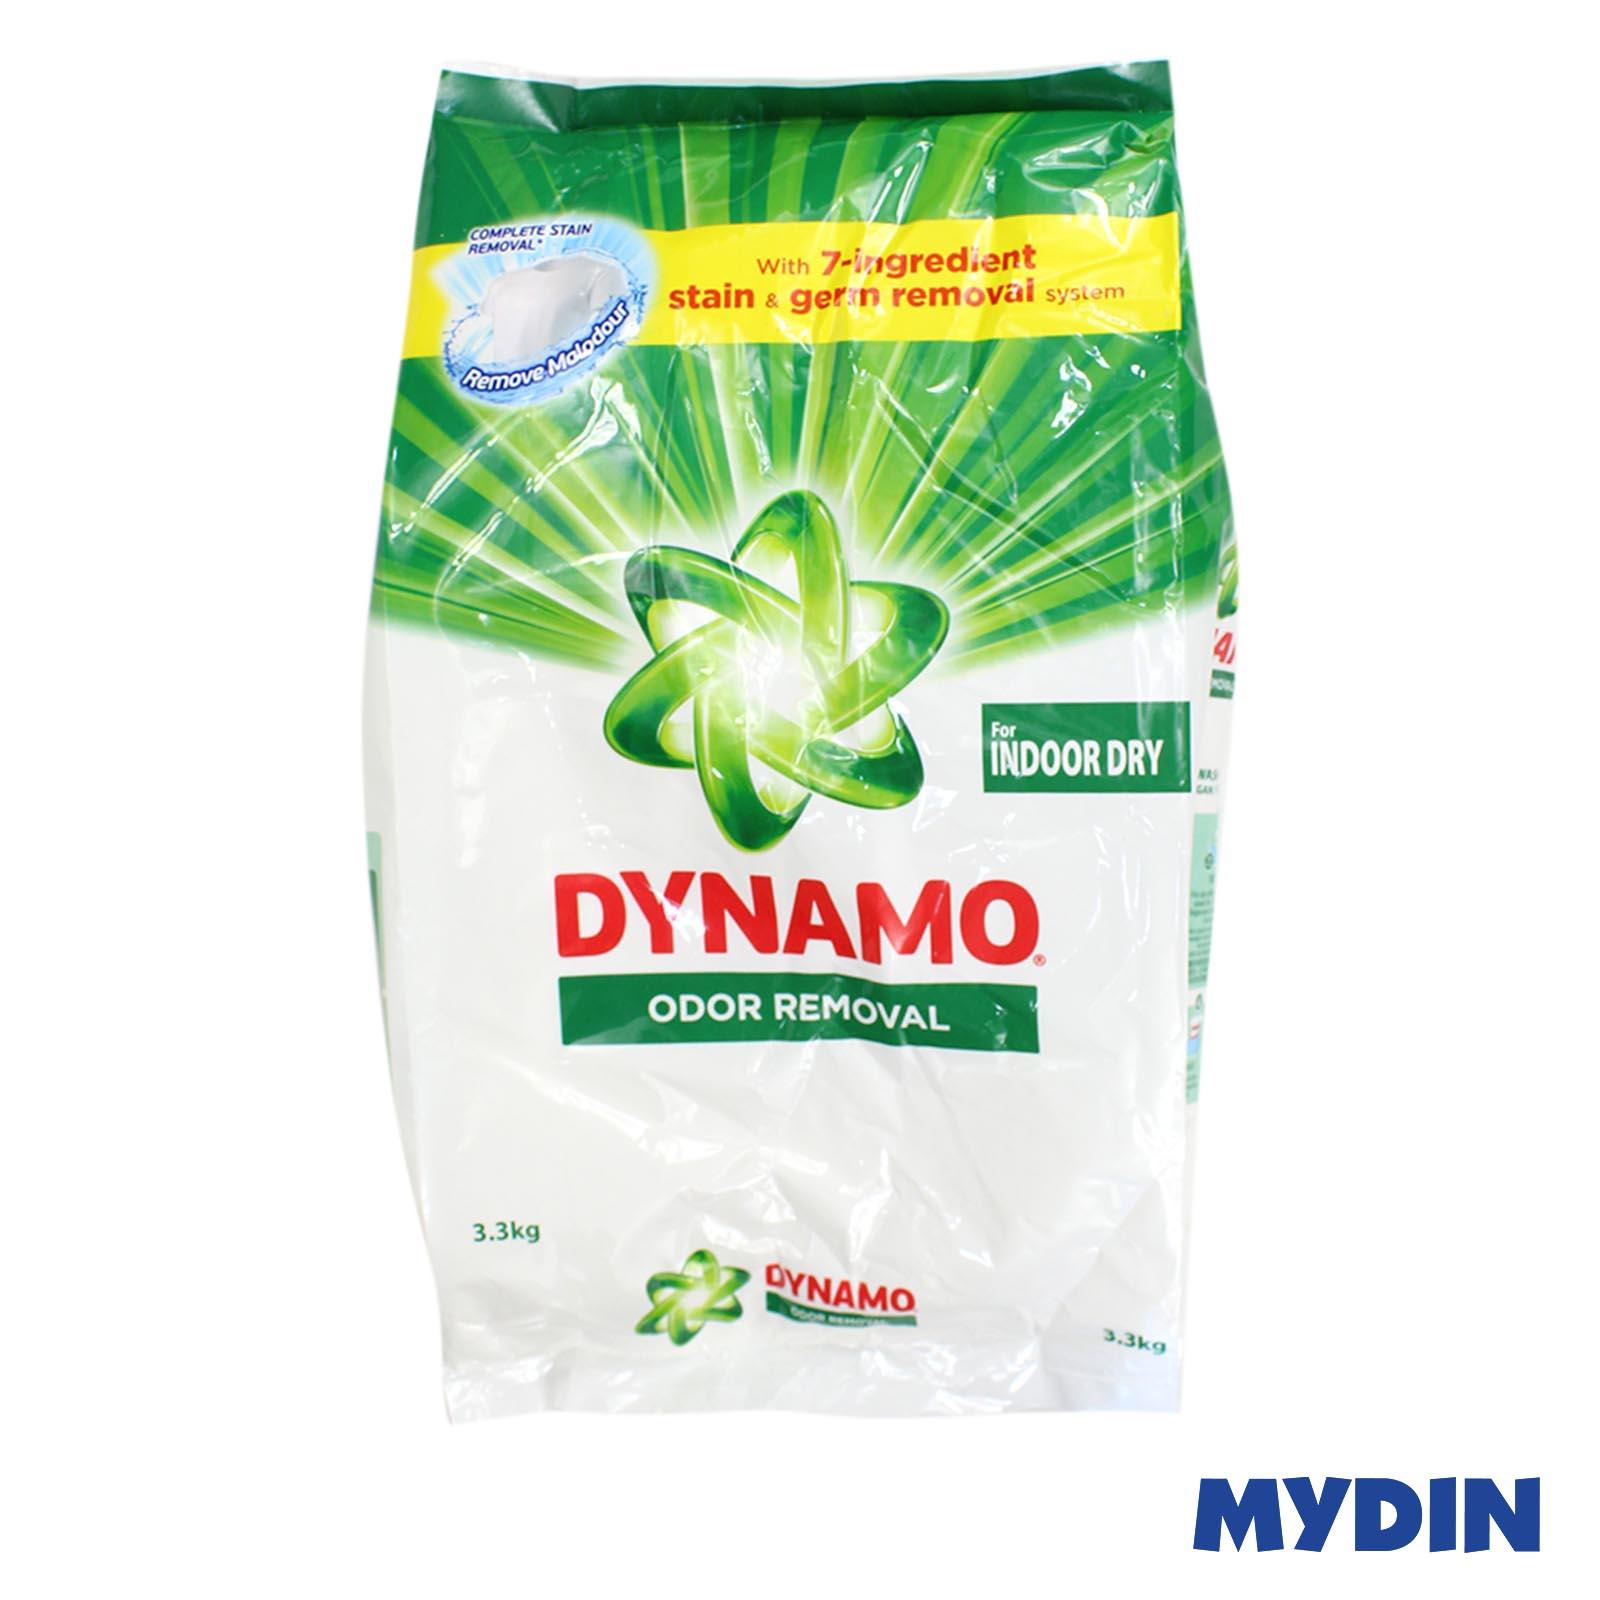 Dynamo Powder Detergent Odor Removal for Indoor Dry (3.3kg)